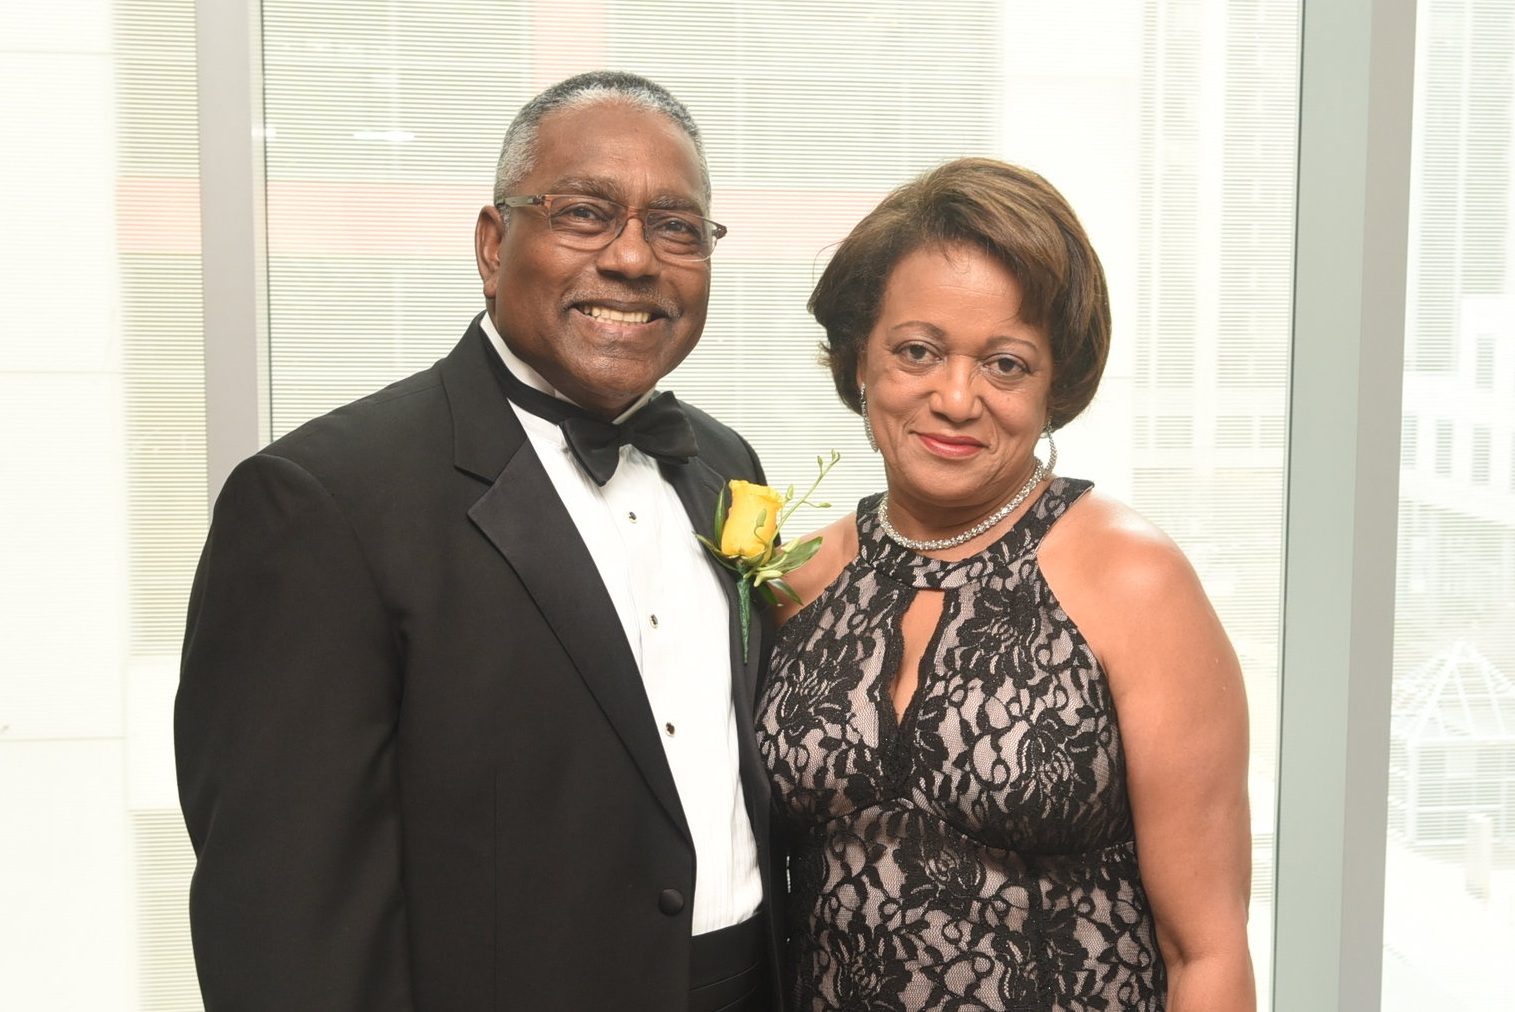 Greg Regis & his wife Althea